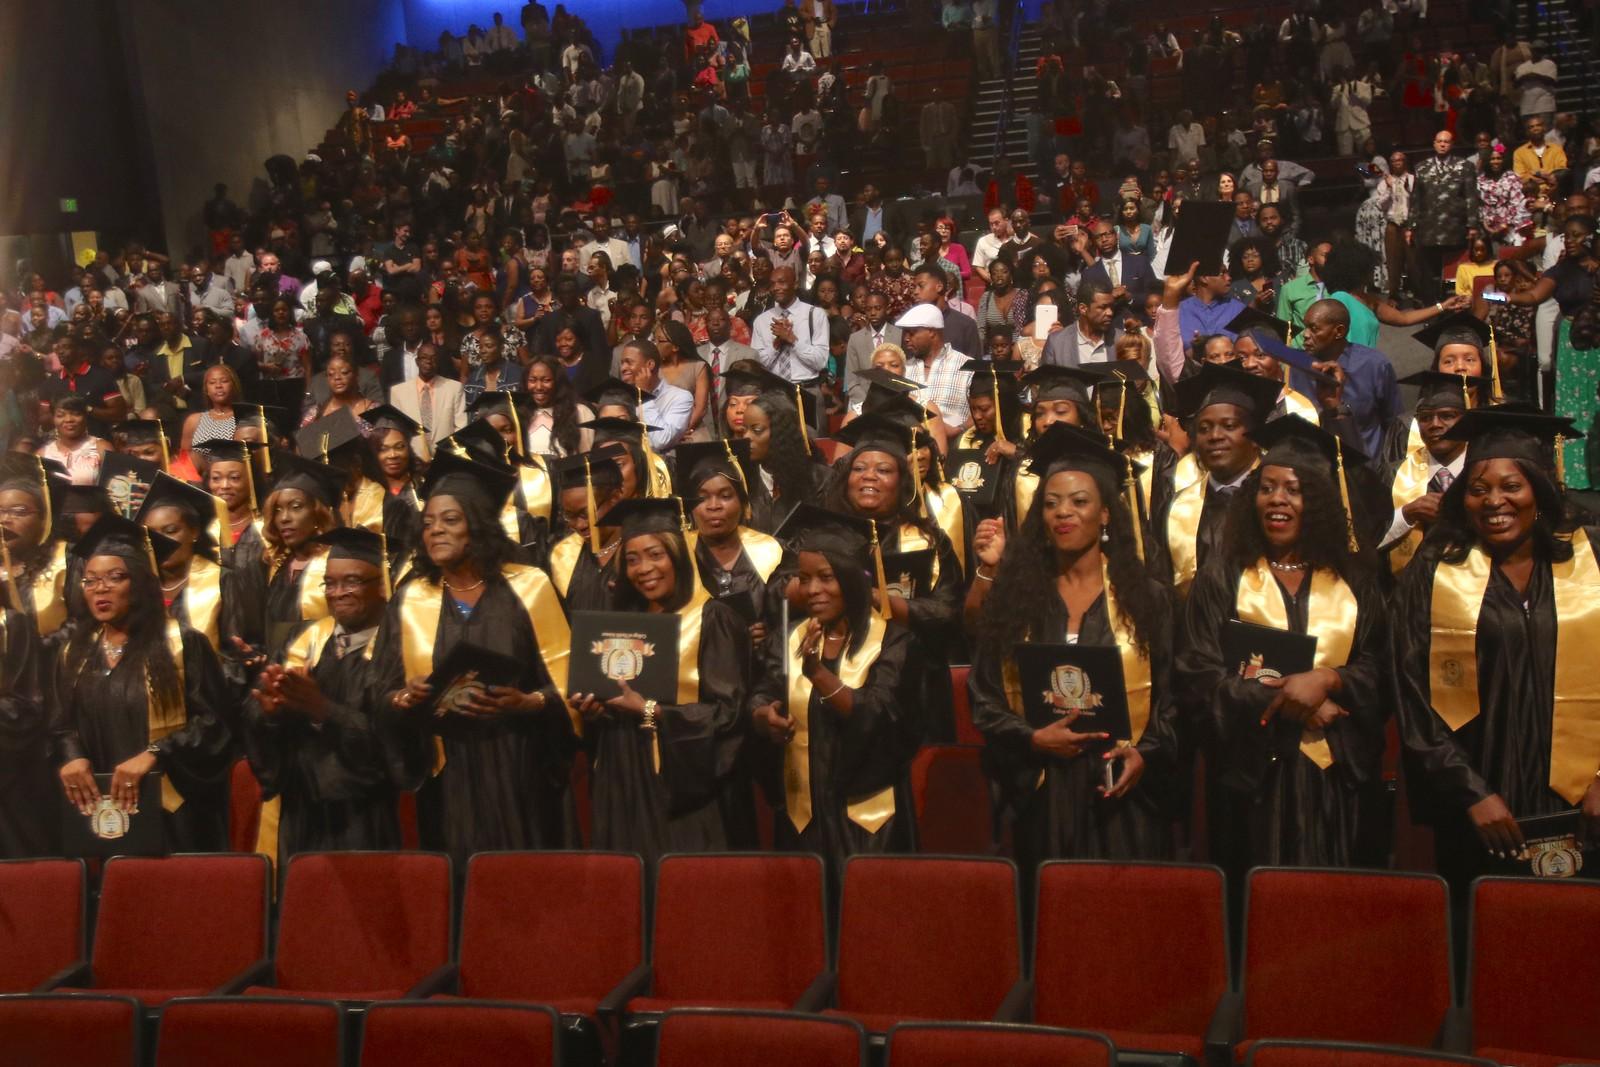 Students having their graduation ceremony